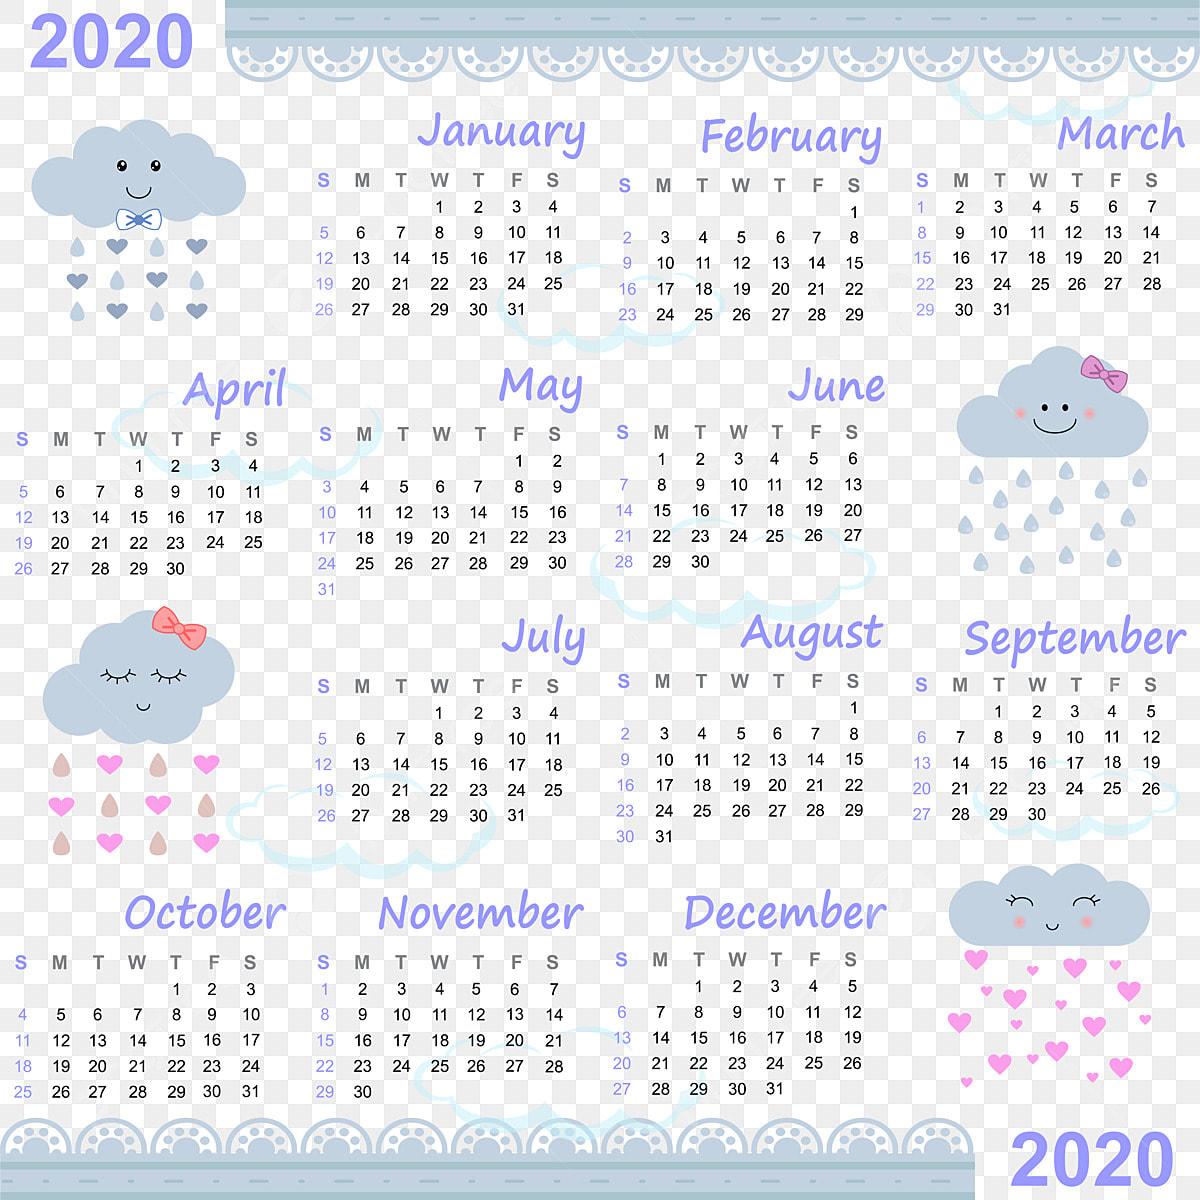 Calendrier Agenda 2020.Agenda 2020 Adore La Pluie Bleu Calendrier Des Affaires